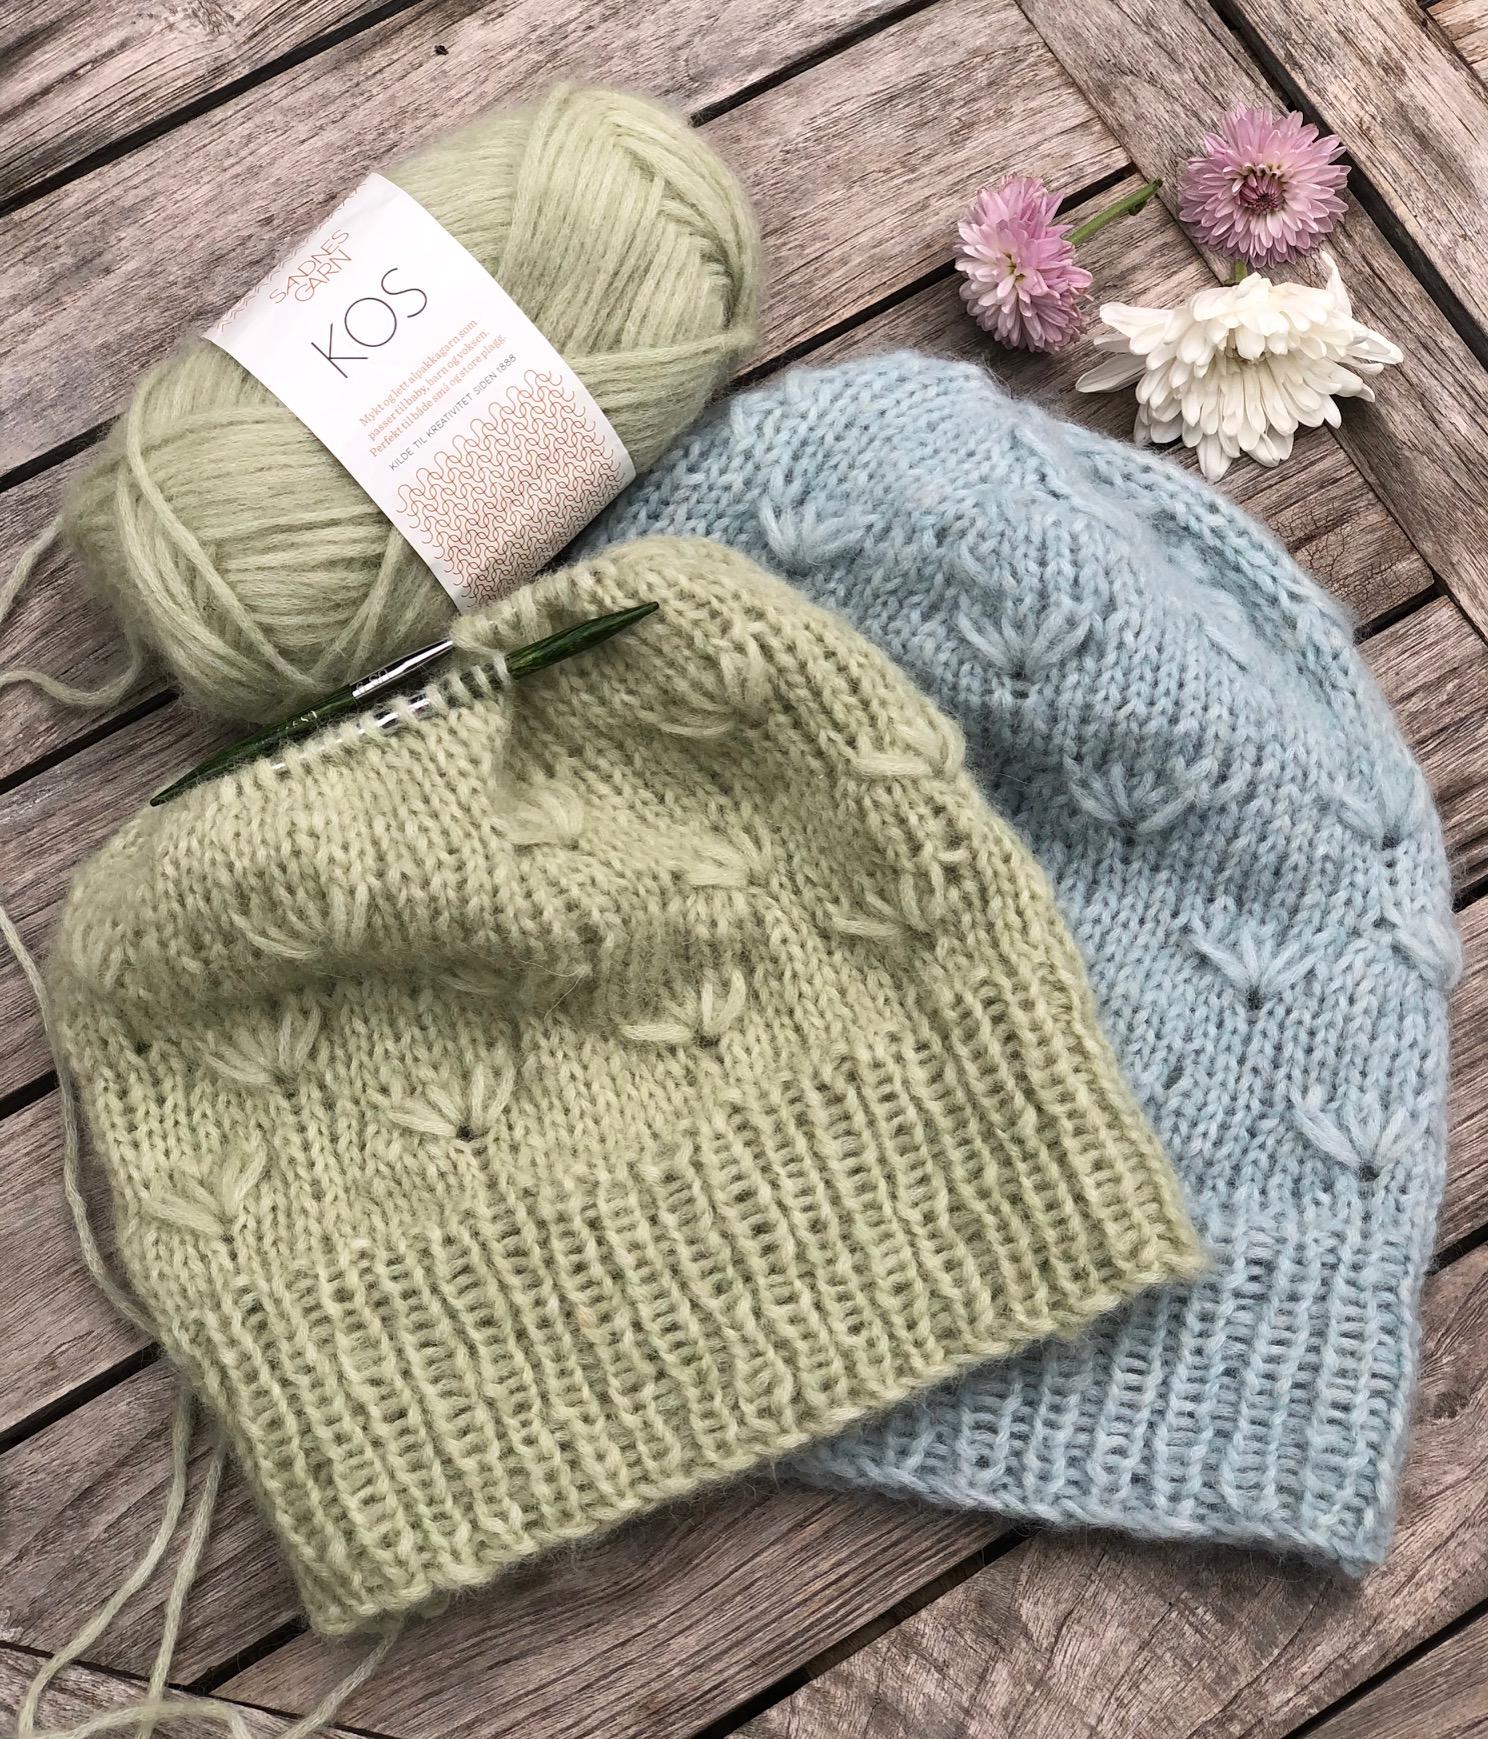 Knitting Class, Dandelion Hat, Sandnes Garn